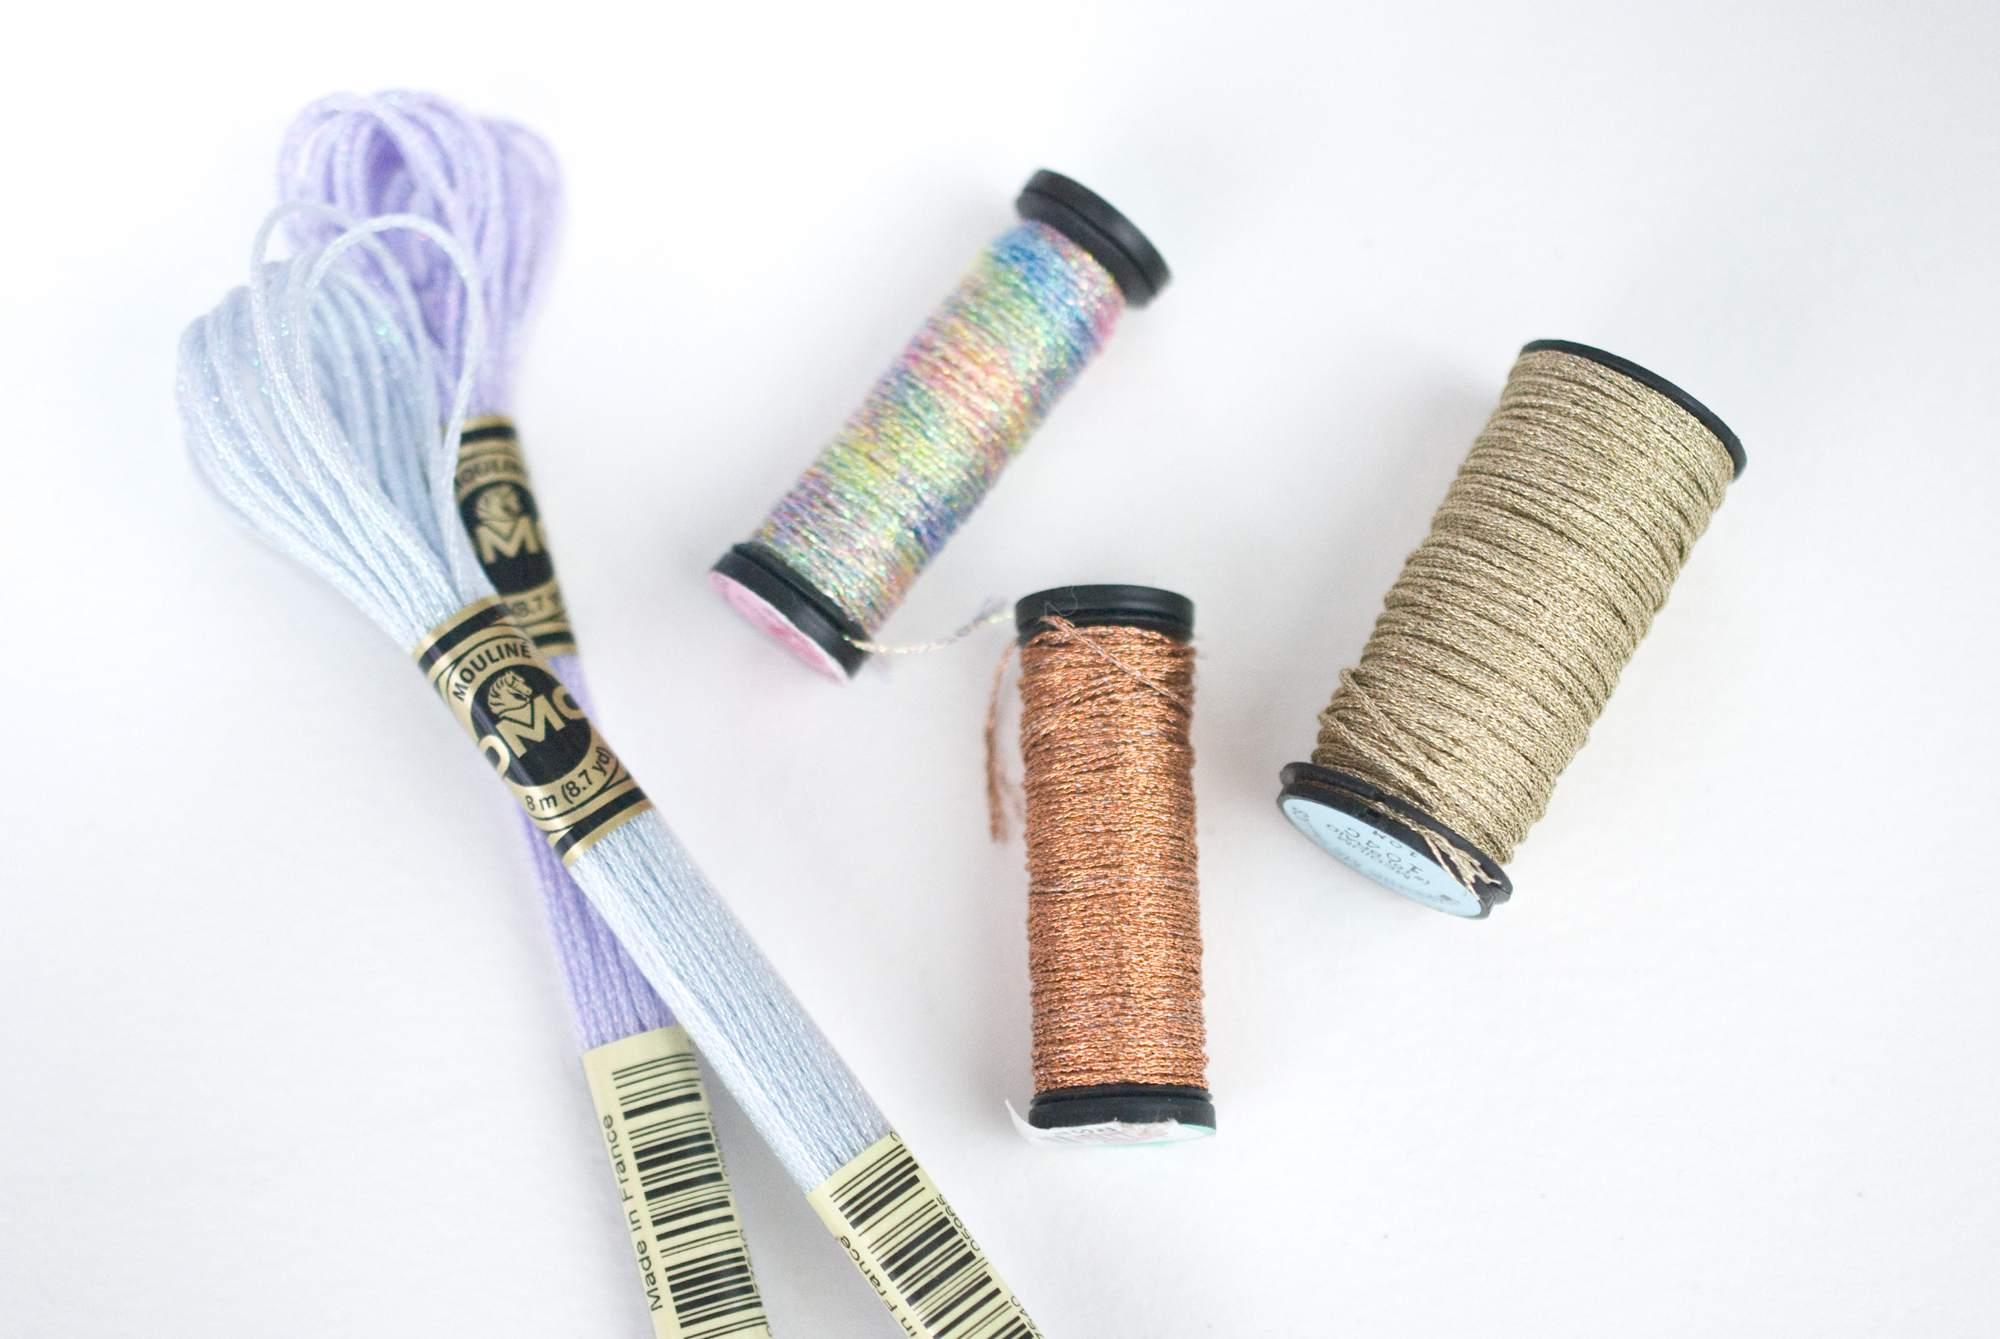 DMC and Kreinik Metallic Threads